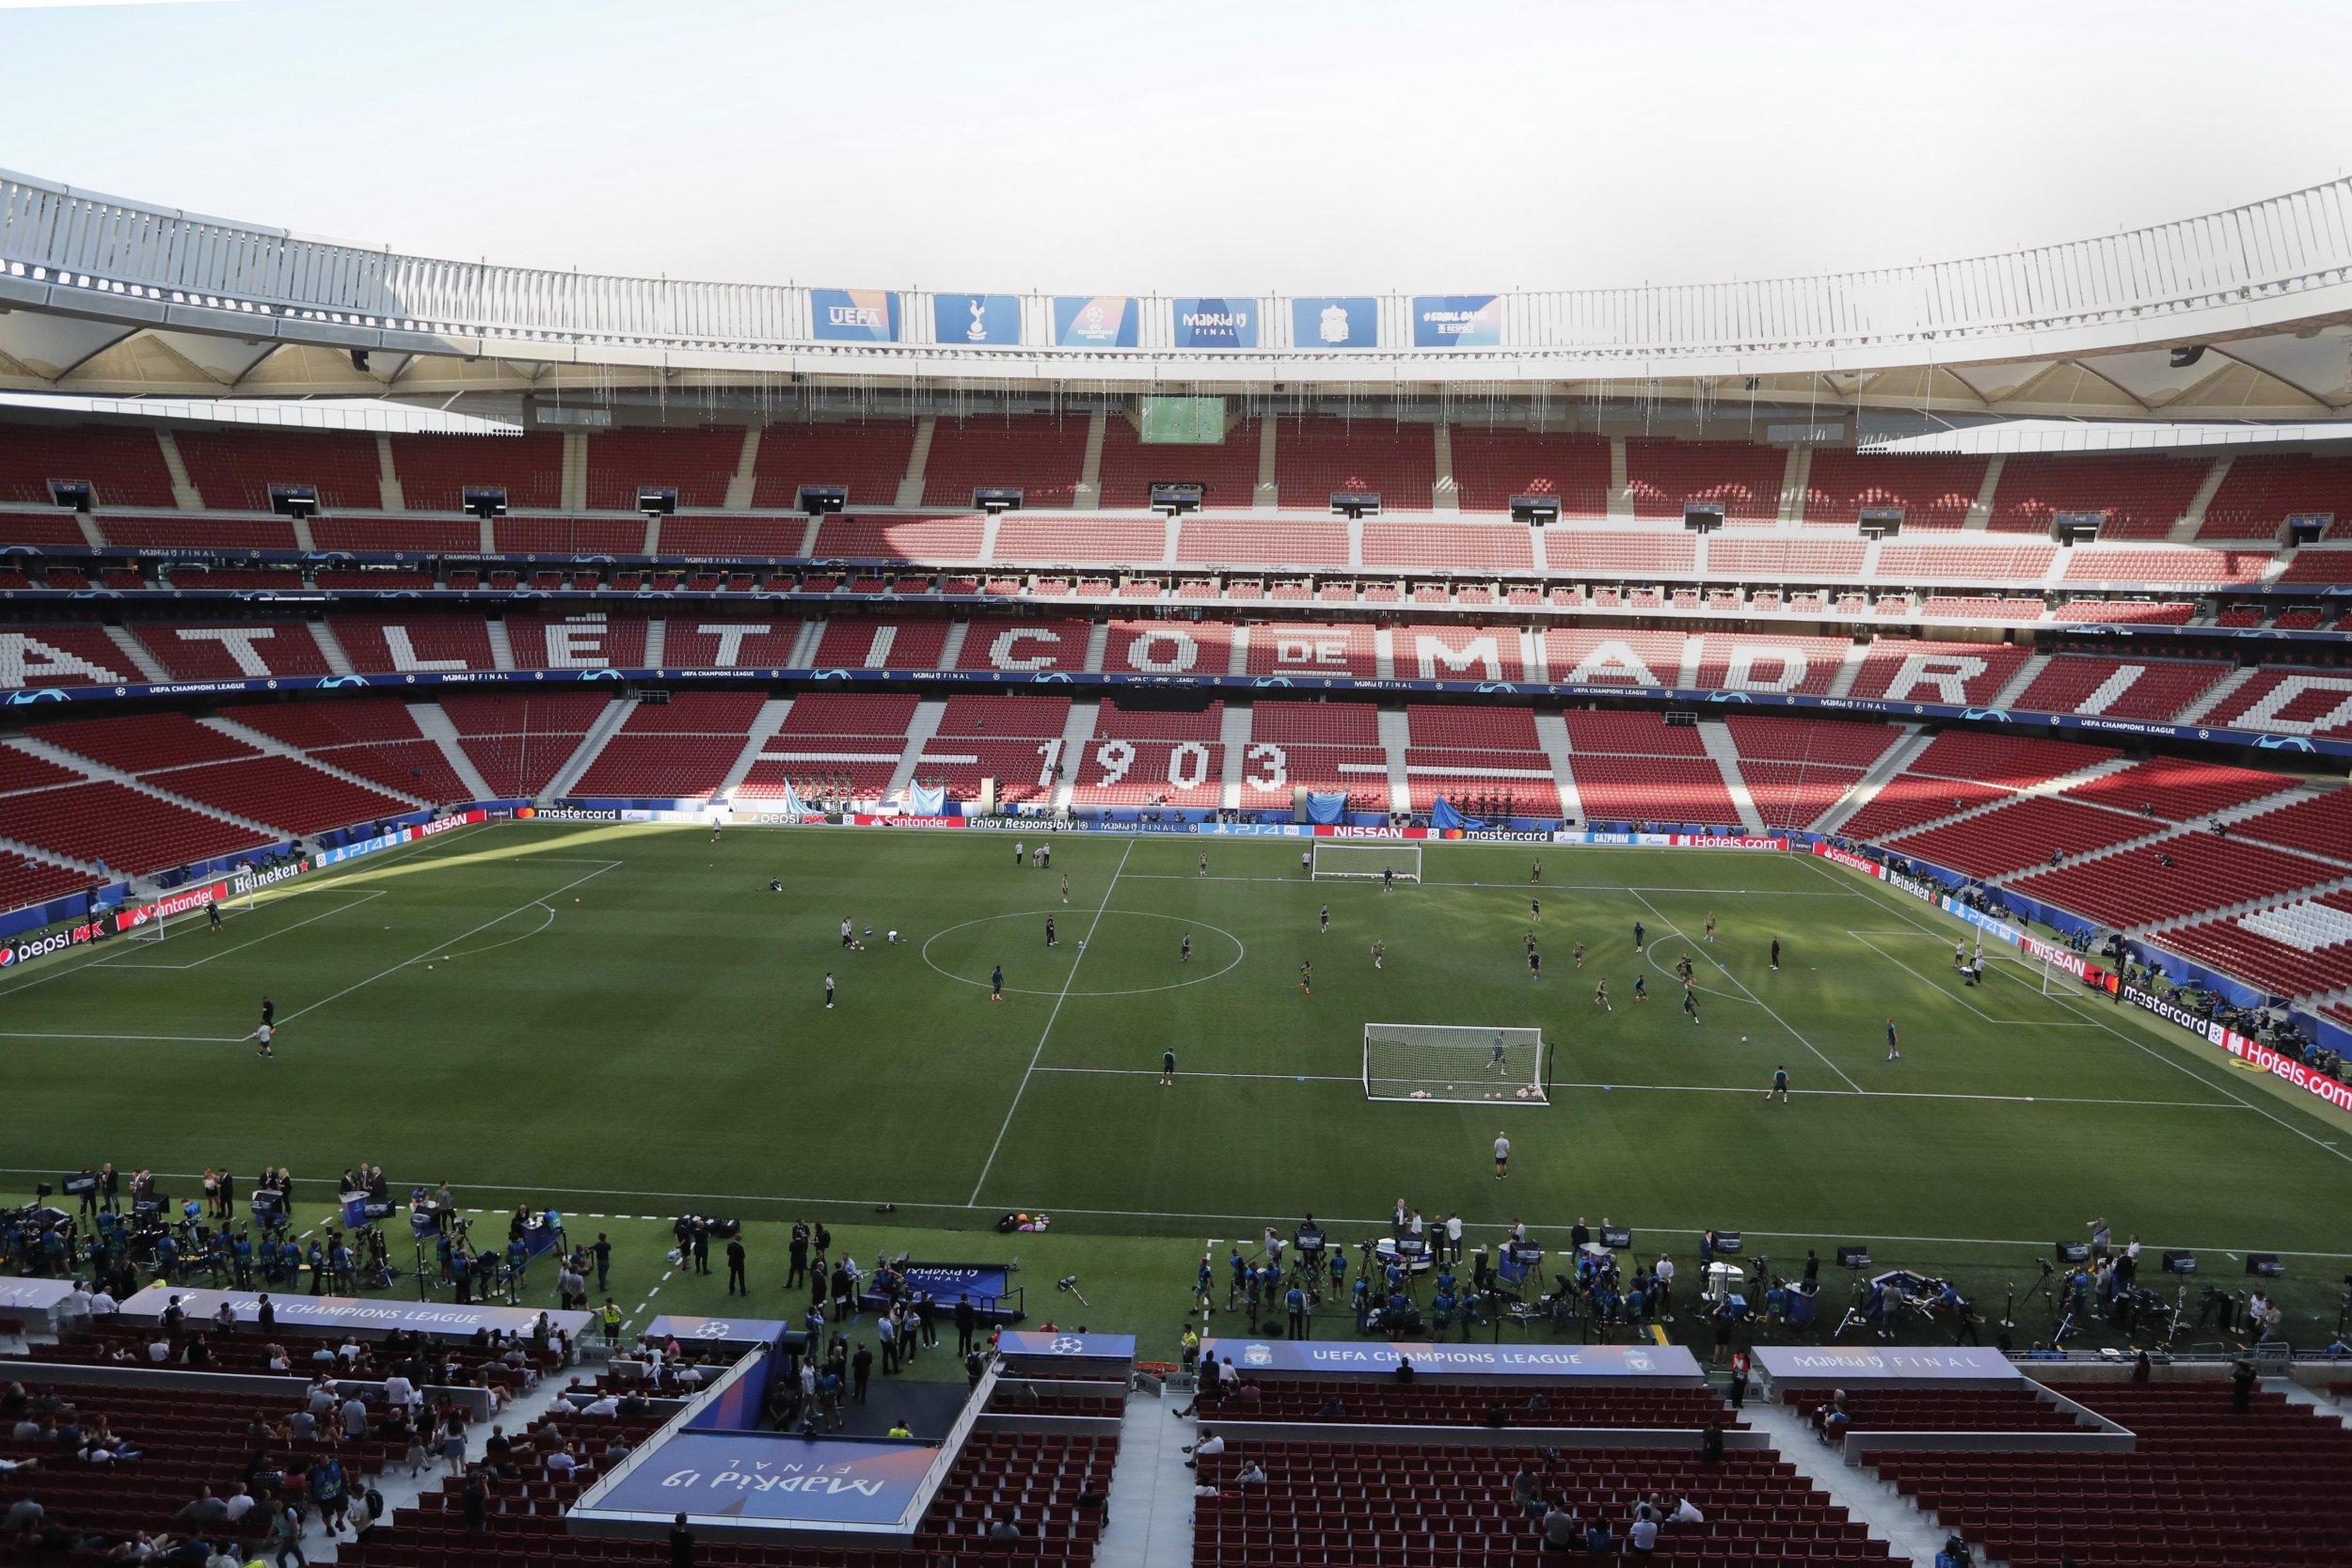 Champions League 2019 Finale, Tottenham vs Liverpool (diretta Rai 1 e Sky Sport)